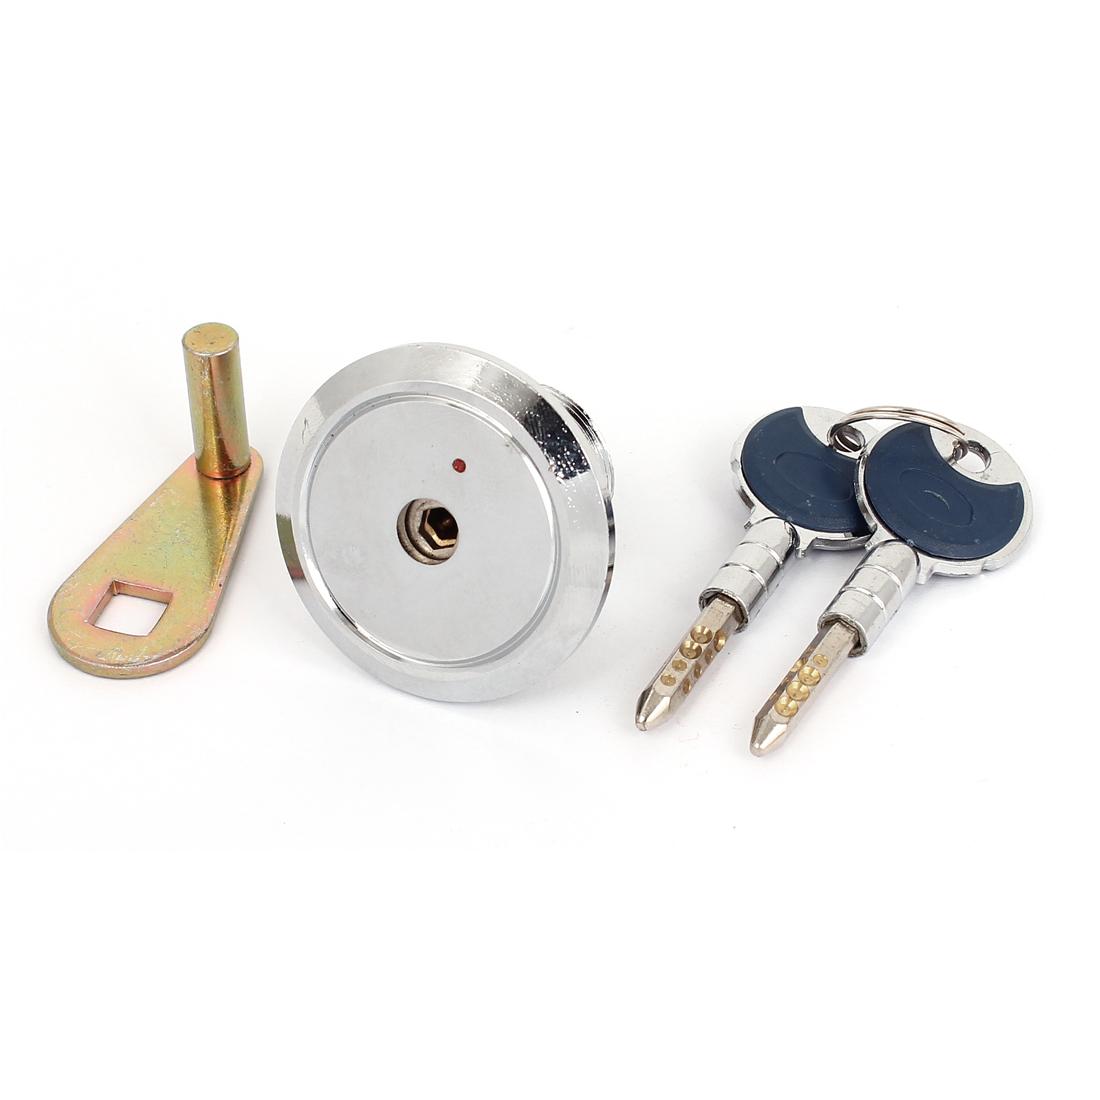 "Cupboard Door 1.8"" Dia Shaft Round Shape Handle Security Lock w Two Keys"